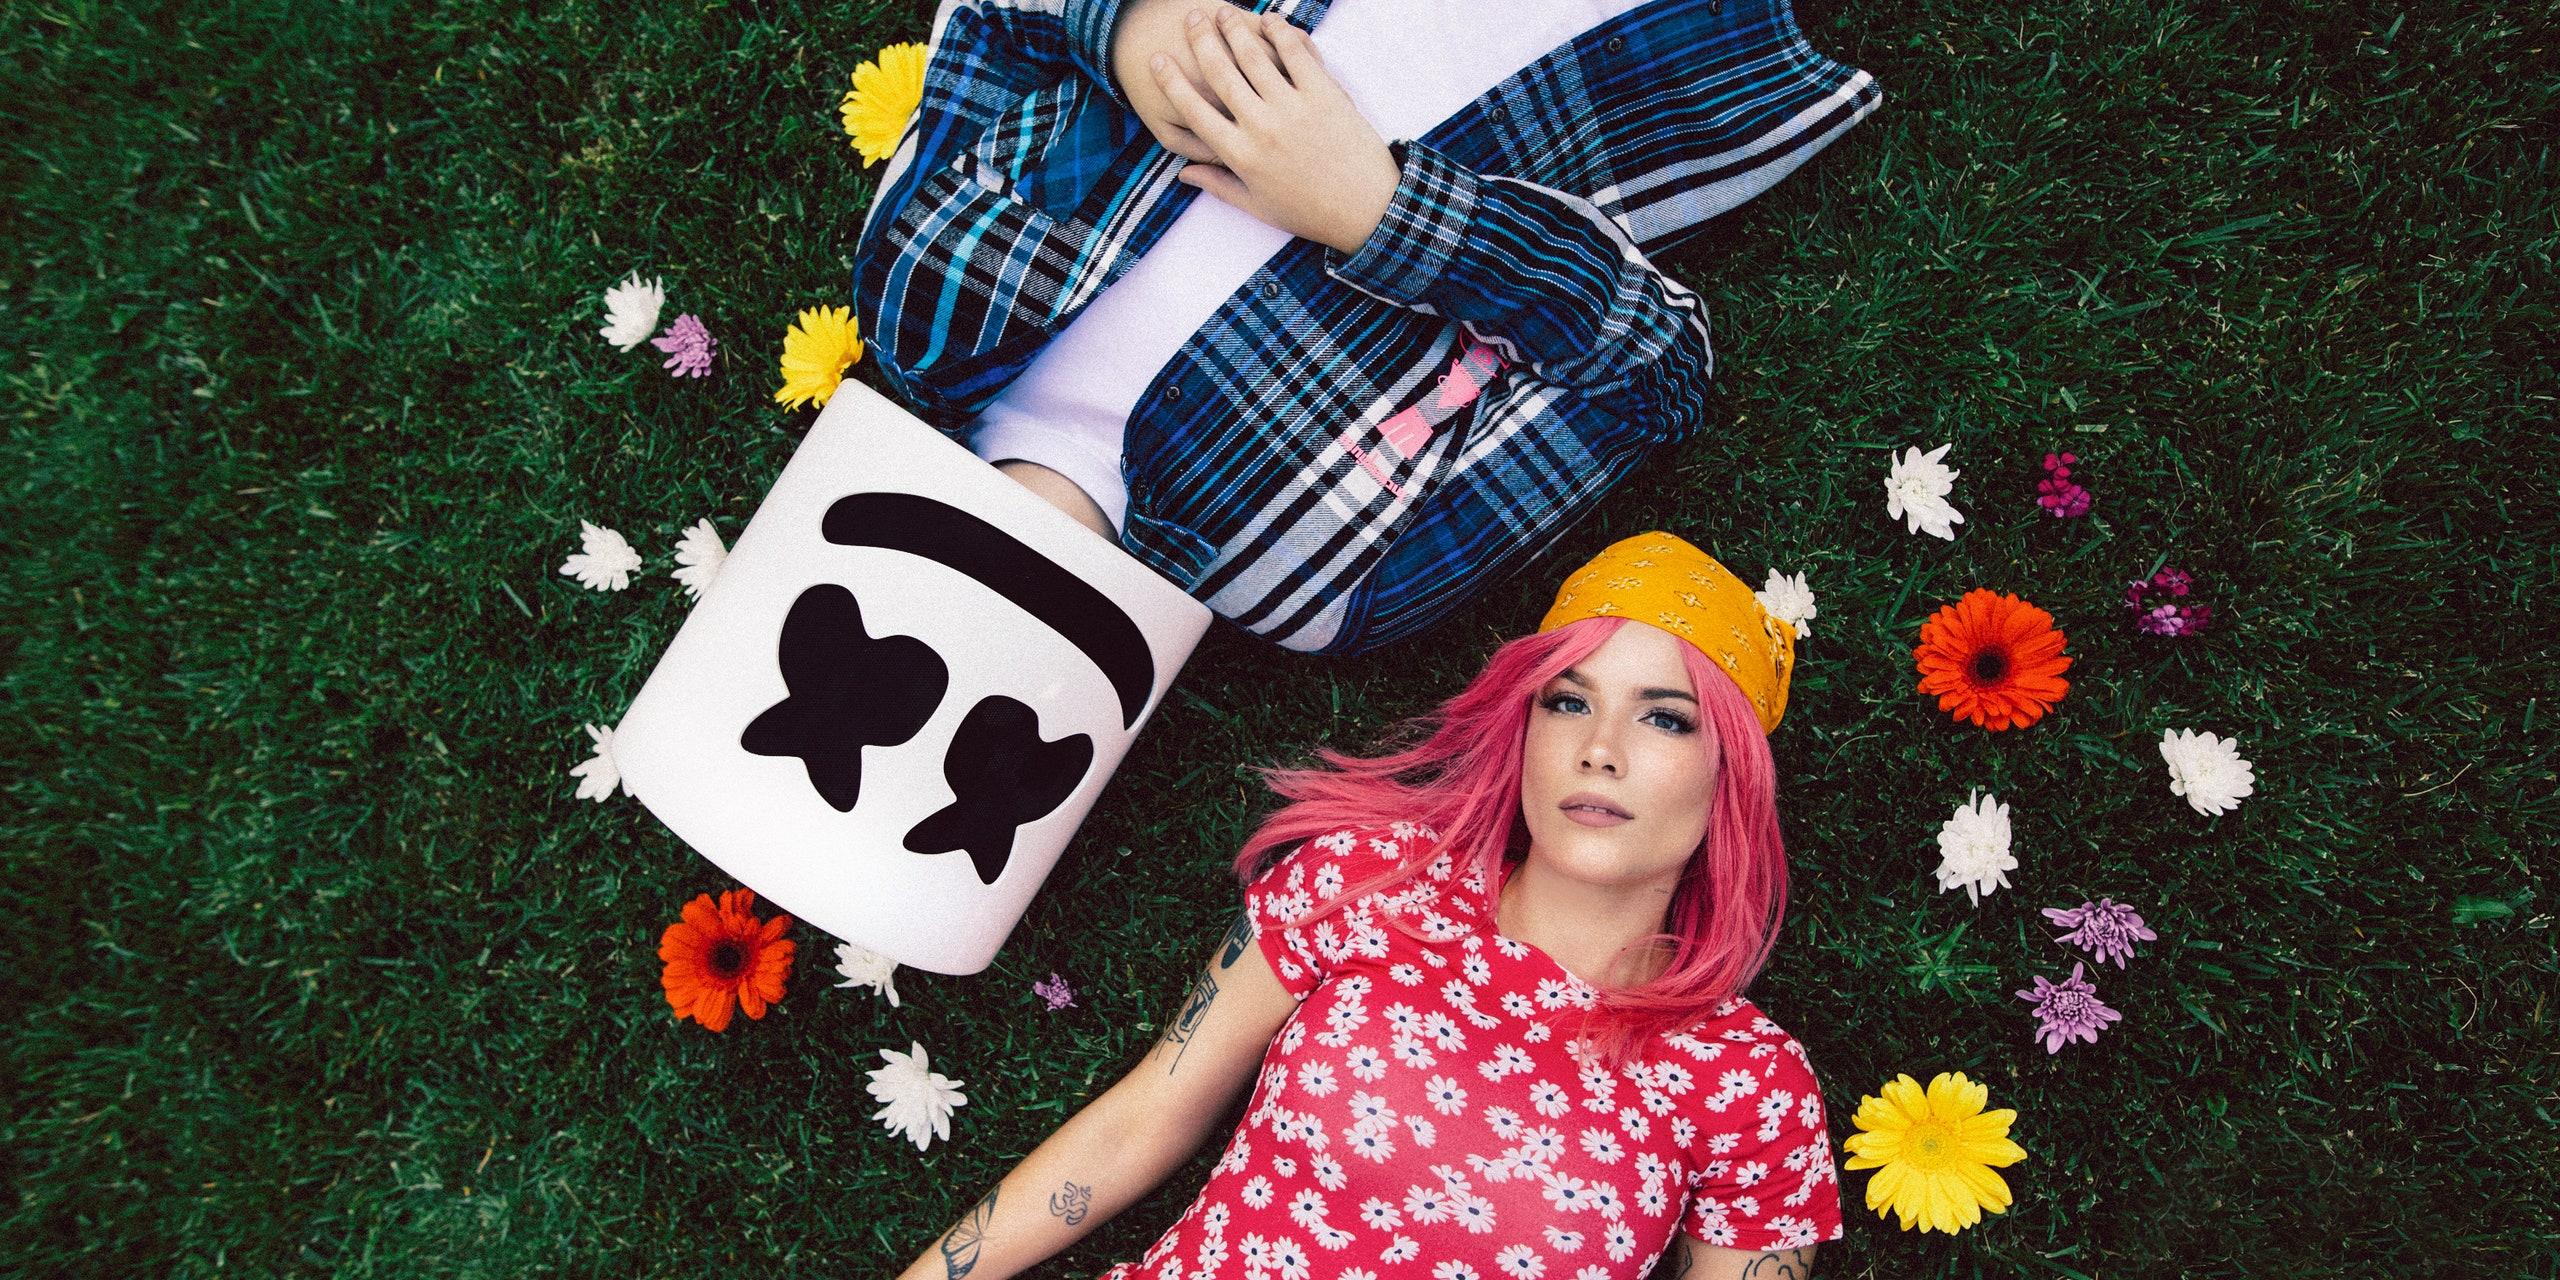 Halsey Marshmello - Marshmello & Halsey - Be Kind